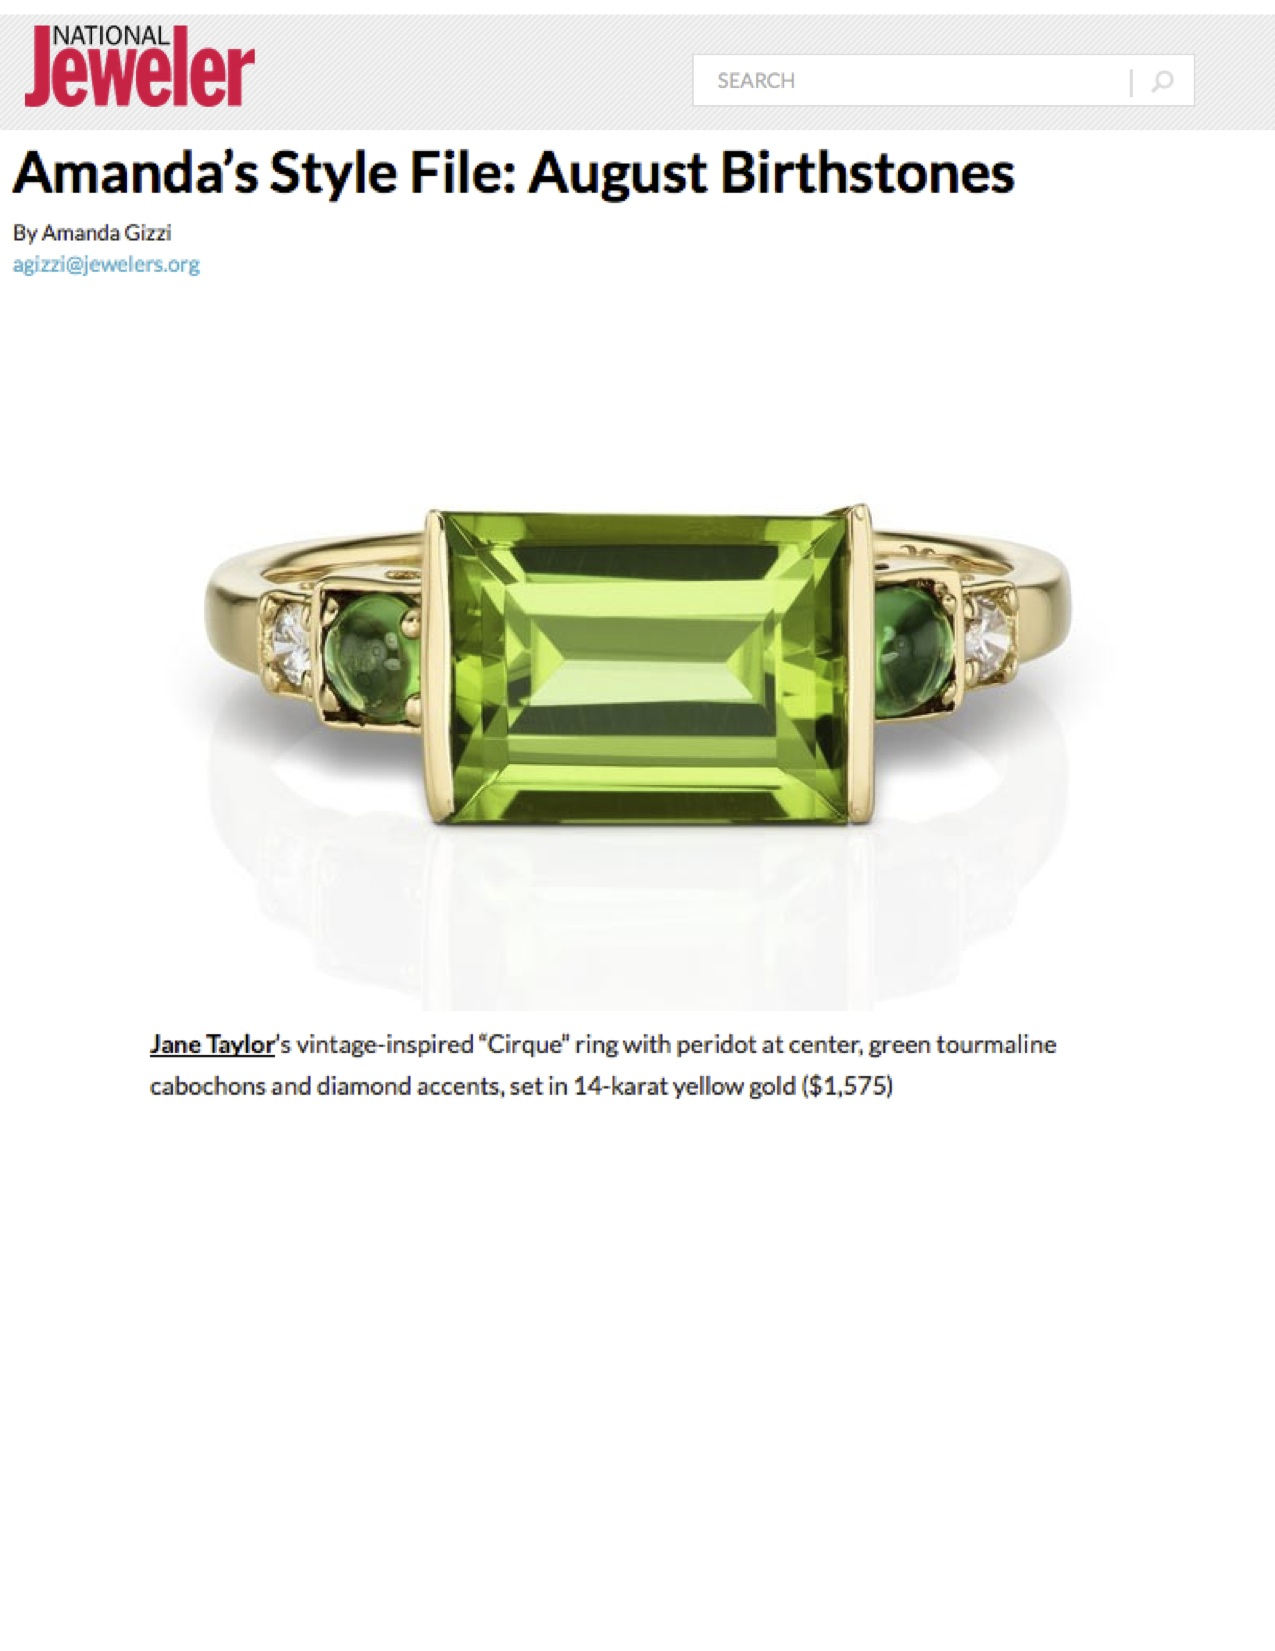 2017-8.10-National Jeweler.com.jpg